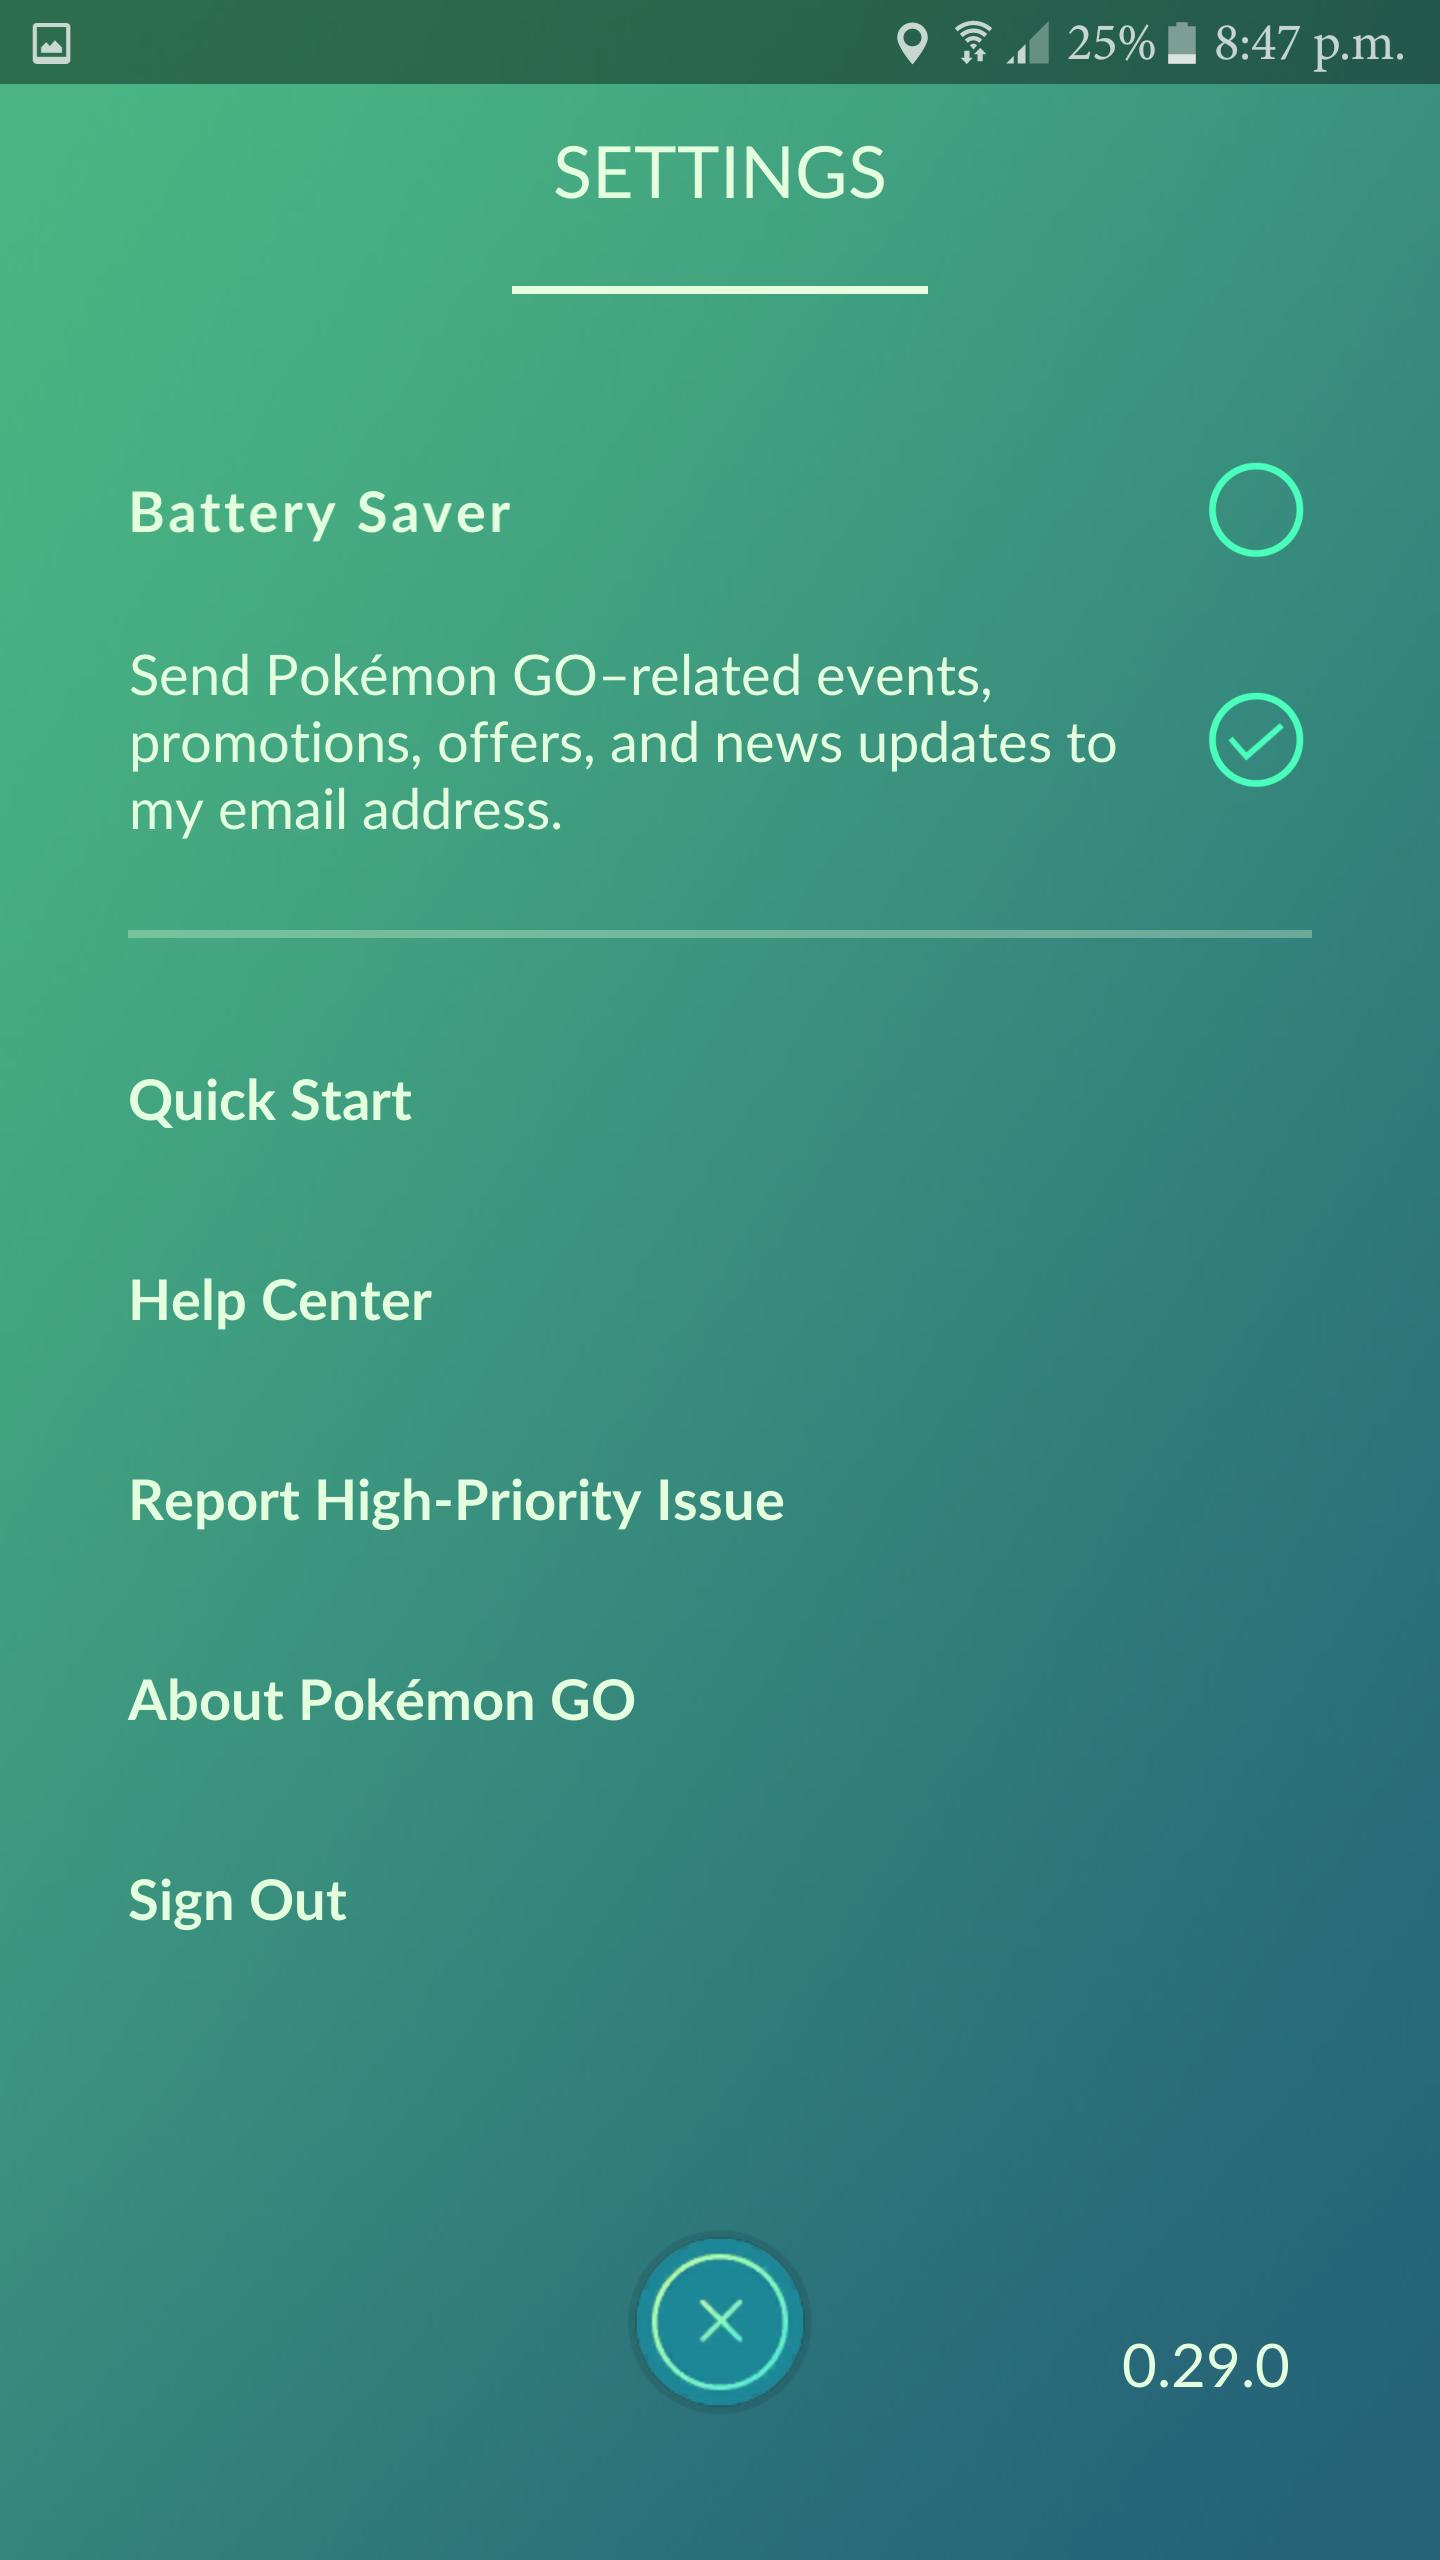 Pokémon GO - Fonts In Use